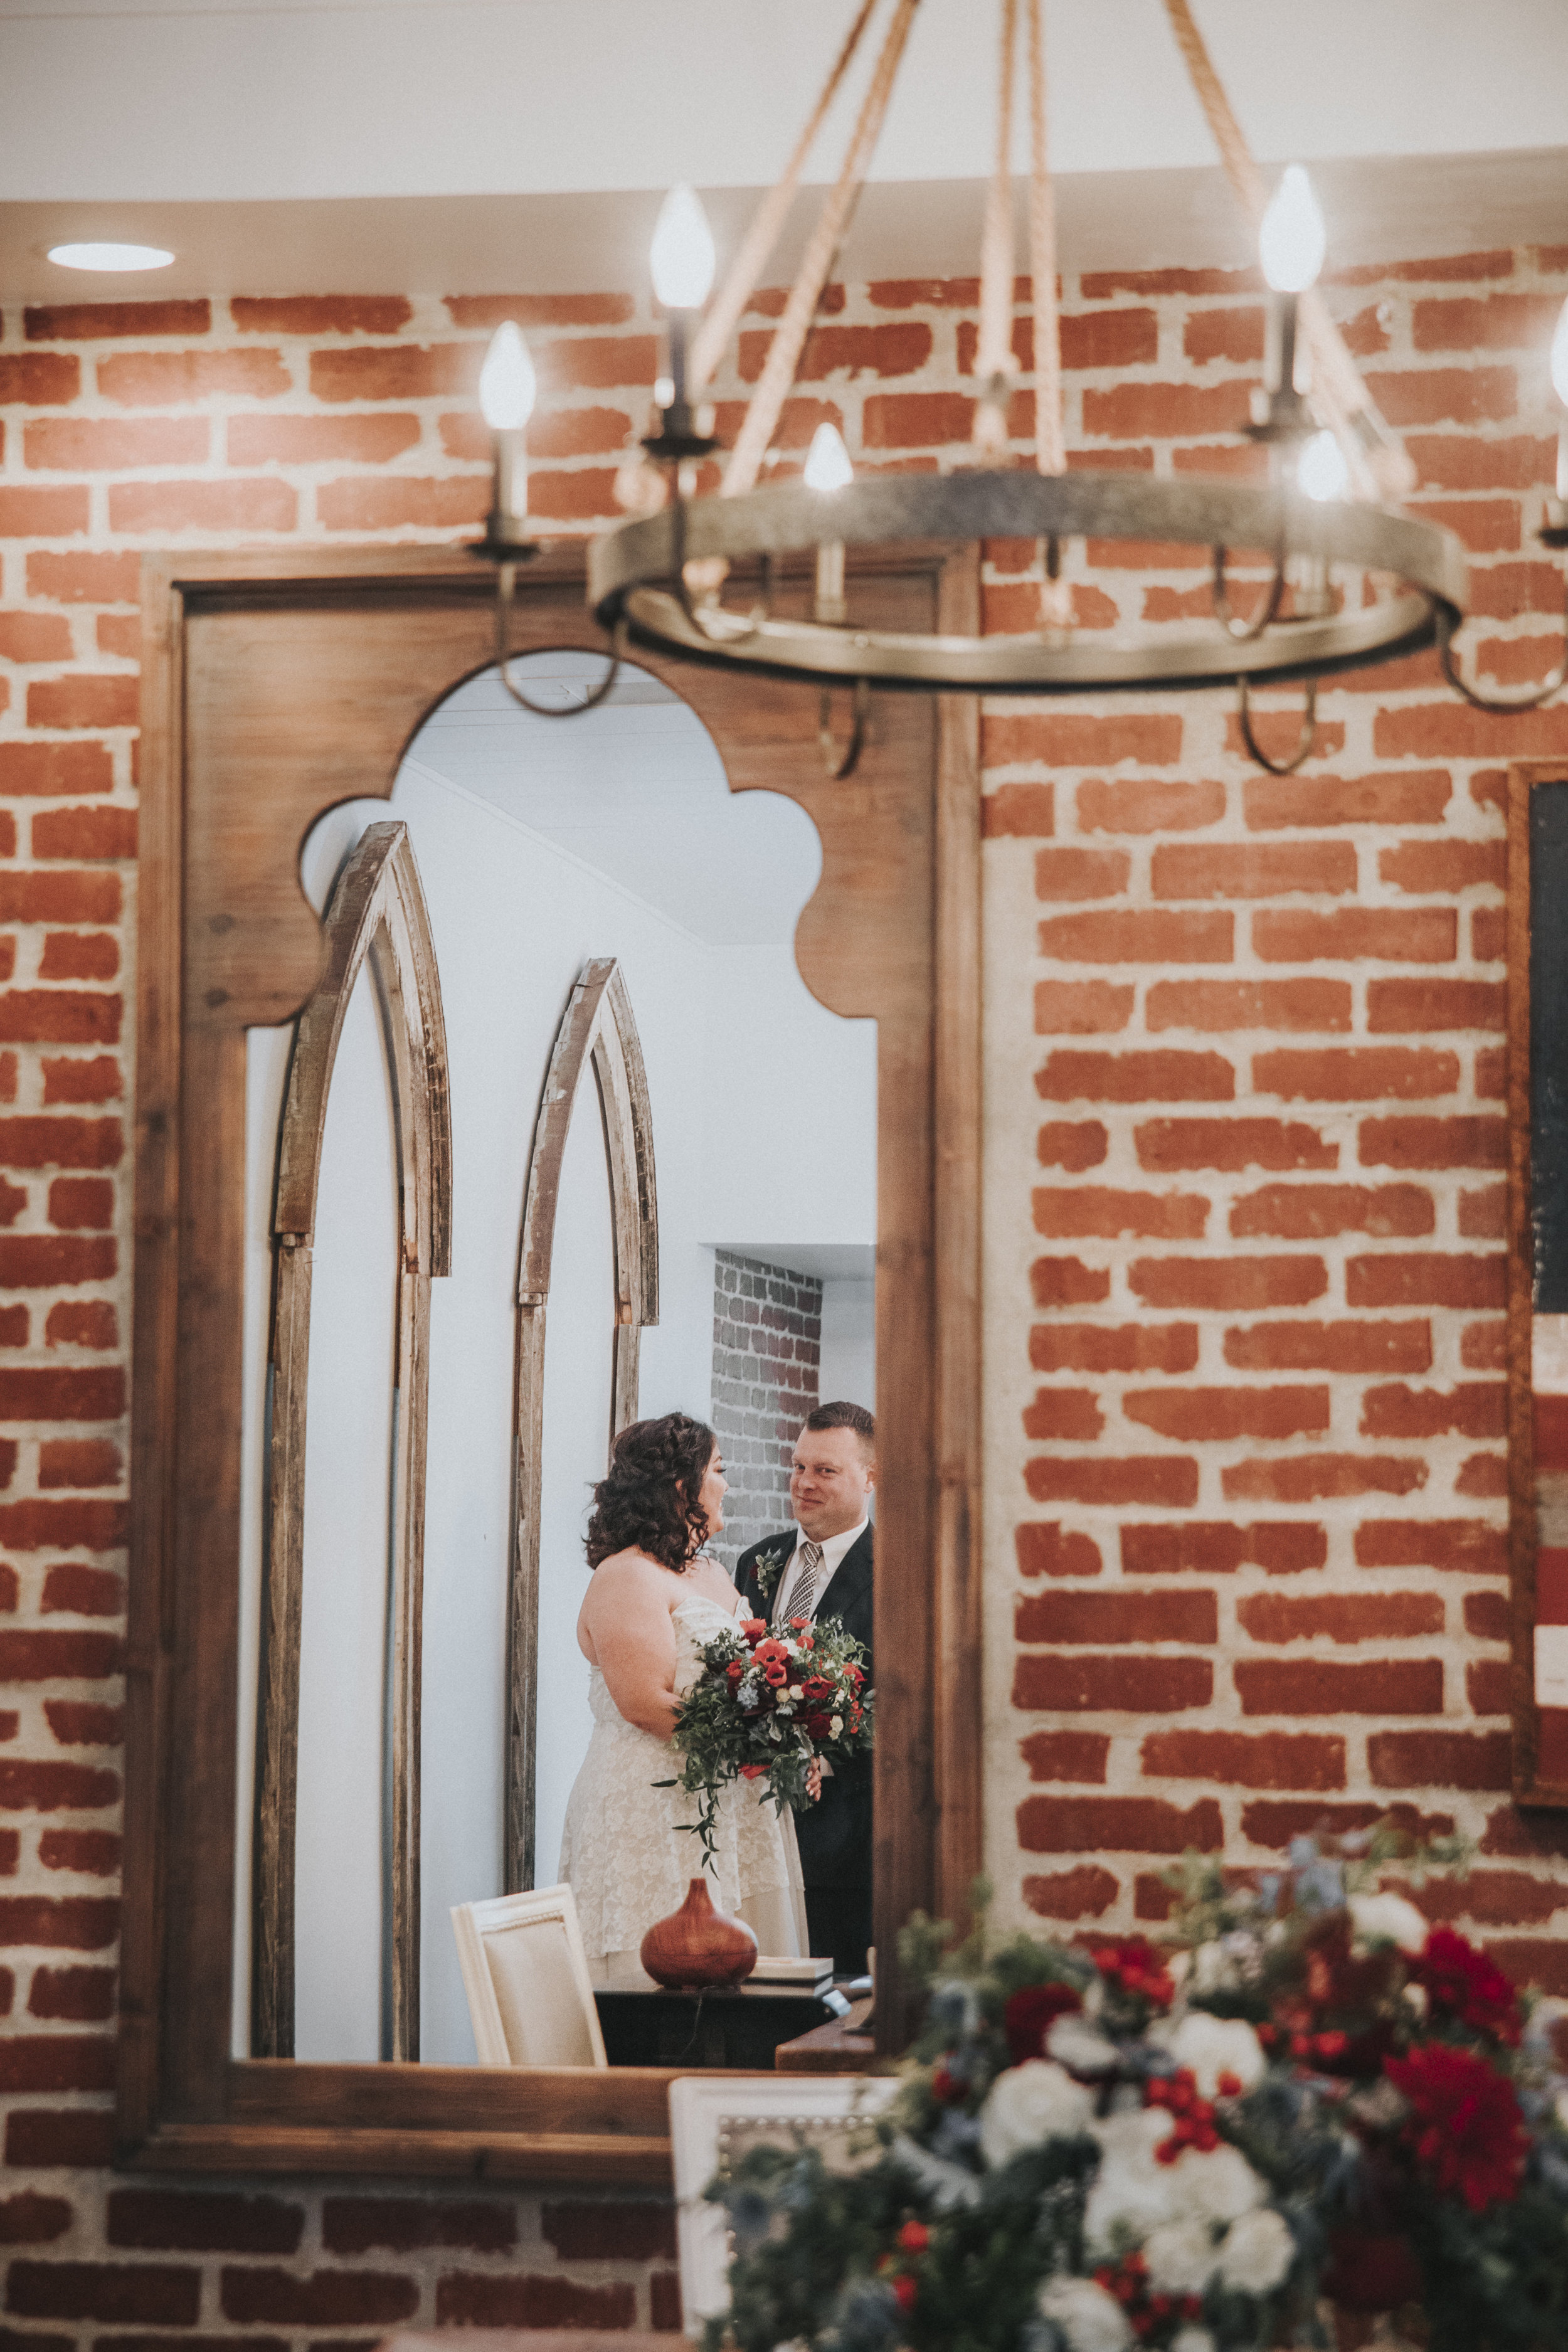 104 midwest-colorado-nebraska-elopement-photography-gretna-turtledoves.jpg